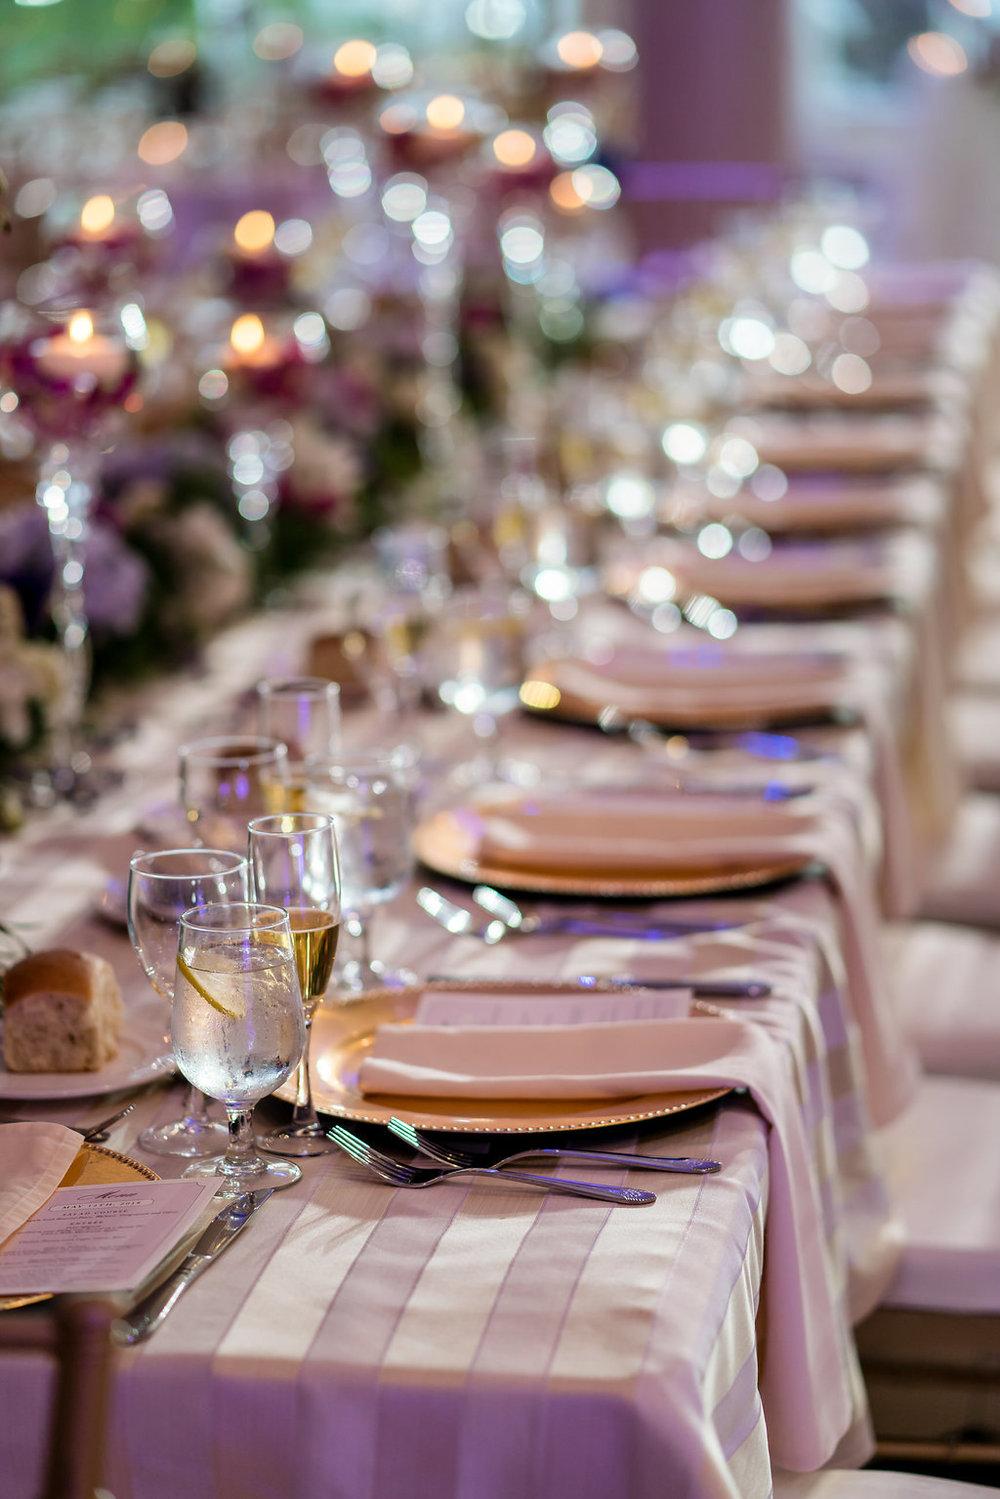 INDIAN WEDDING TABLE SETTING.jpg